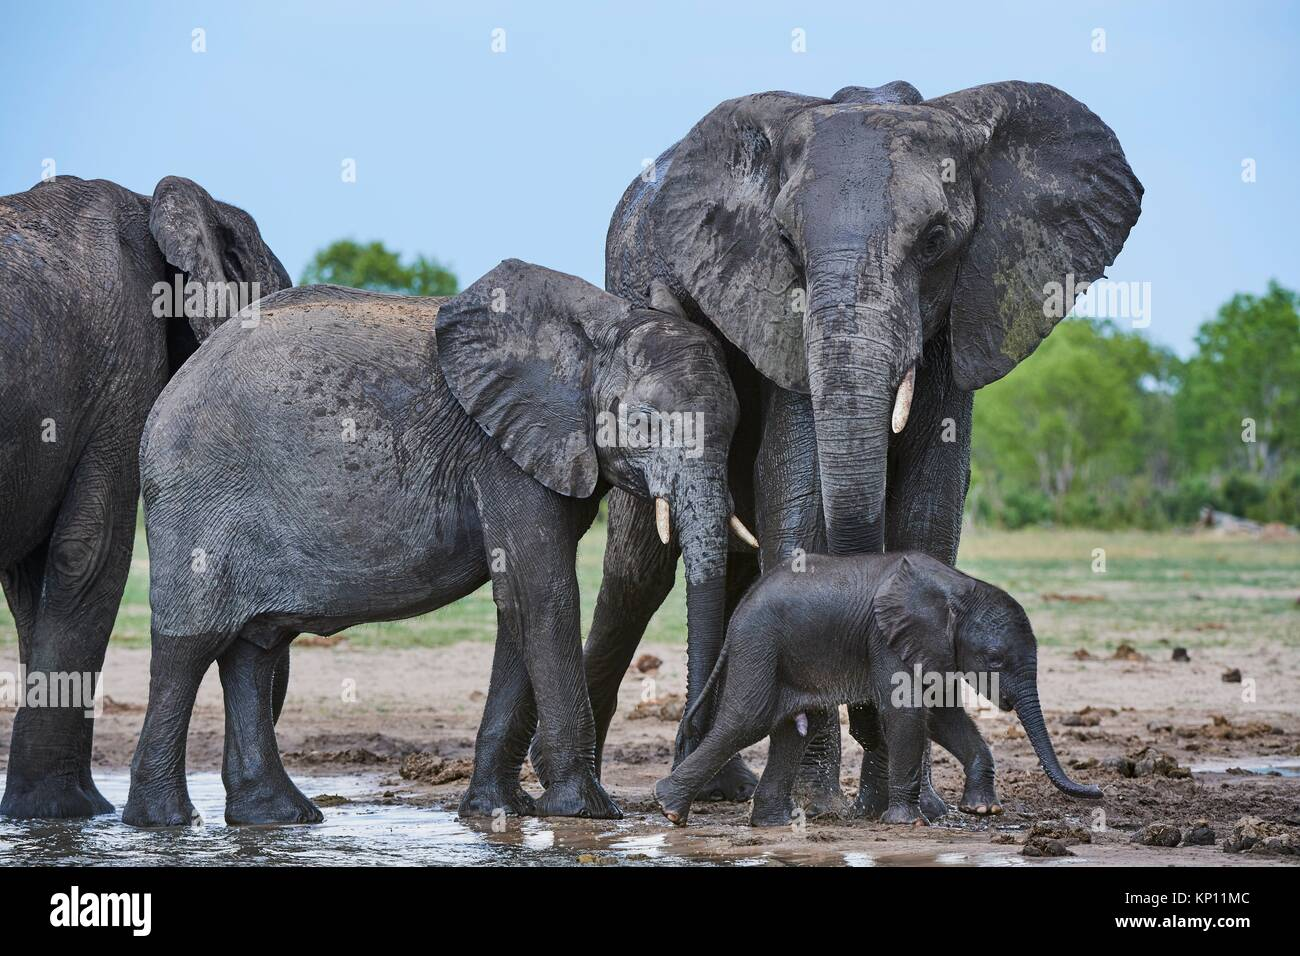 Elefante africano (Loxodonta africana) con un bimbo a bere a watehole. Parco Nazionale di Hwange, Zimbabwe. Immagini Stock